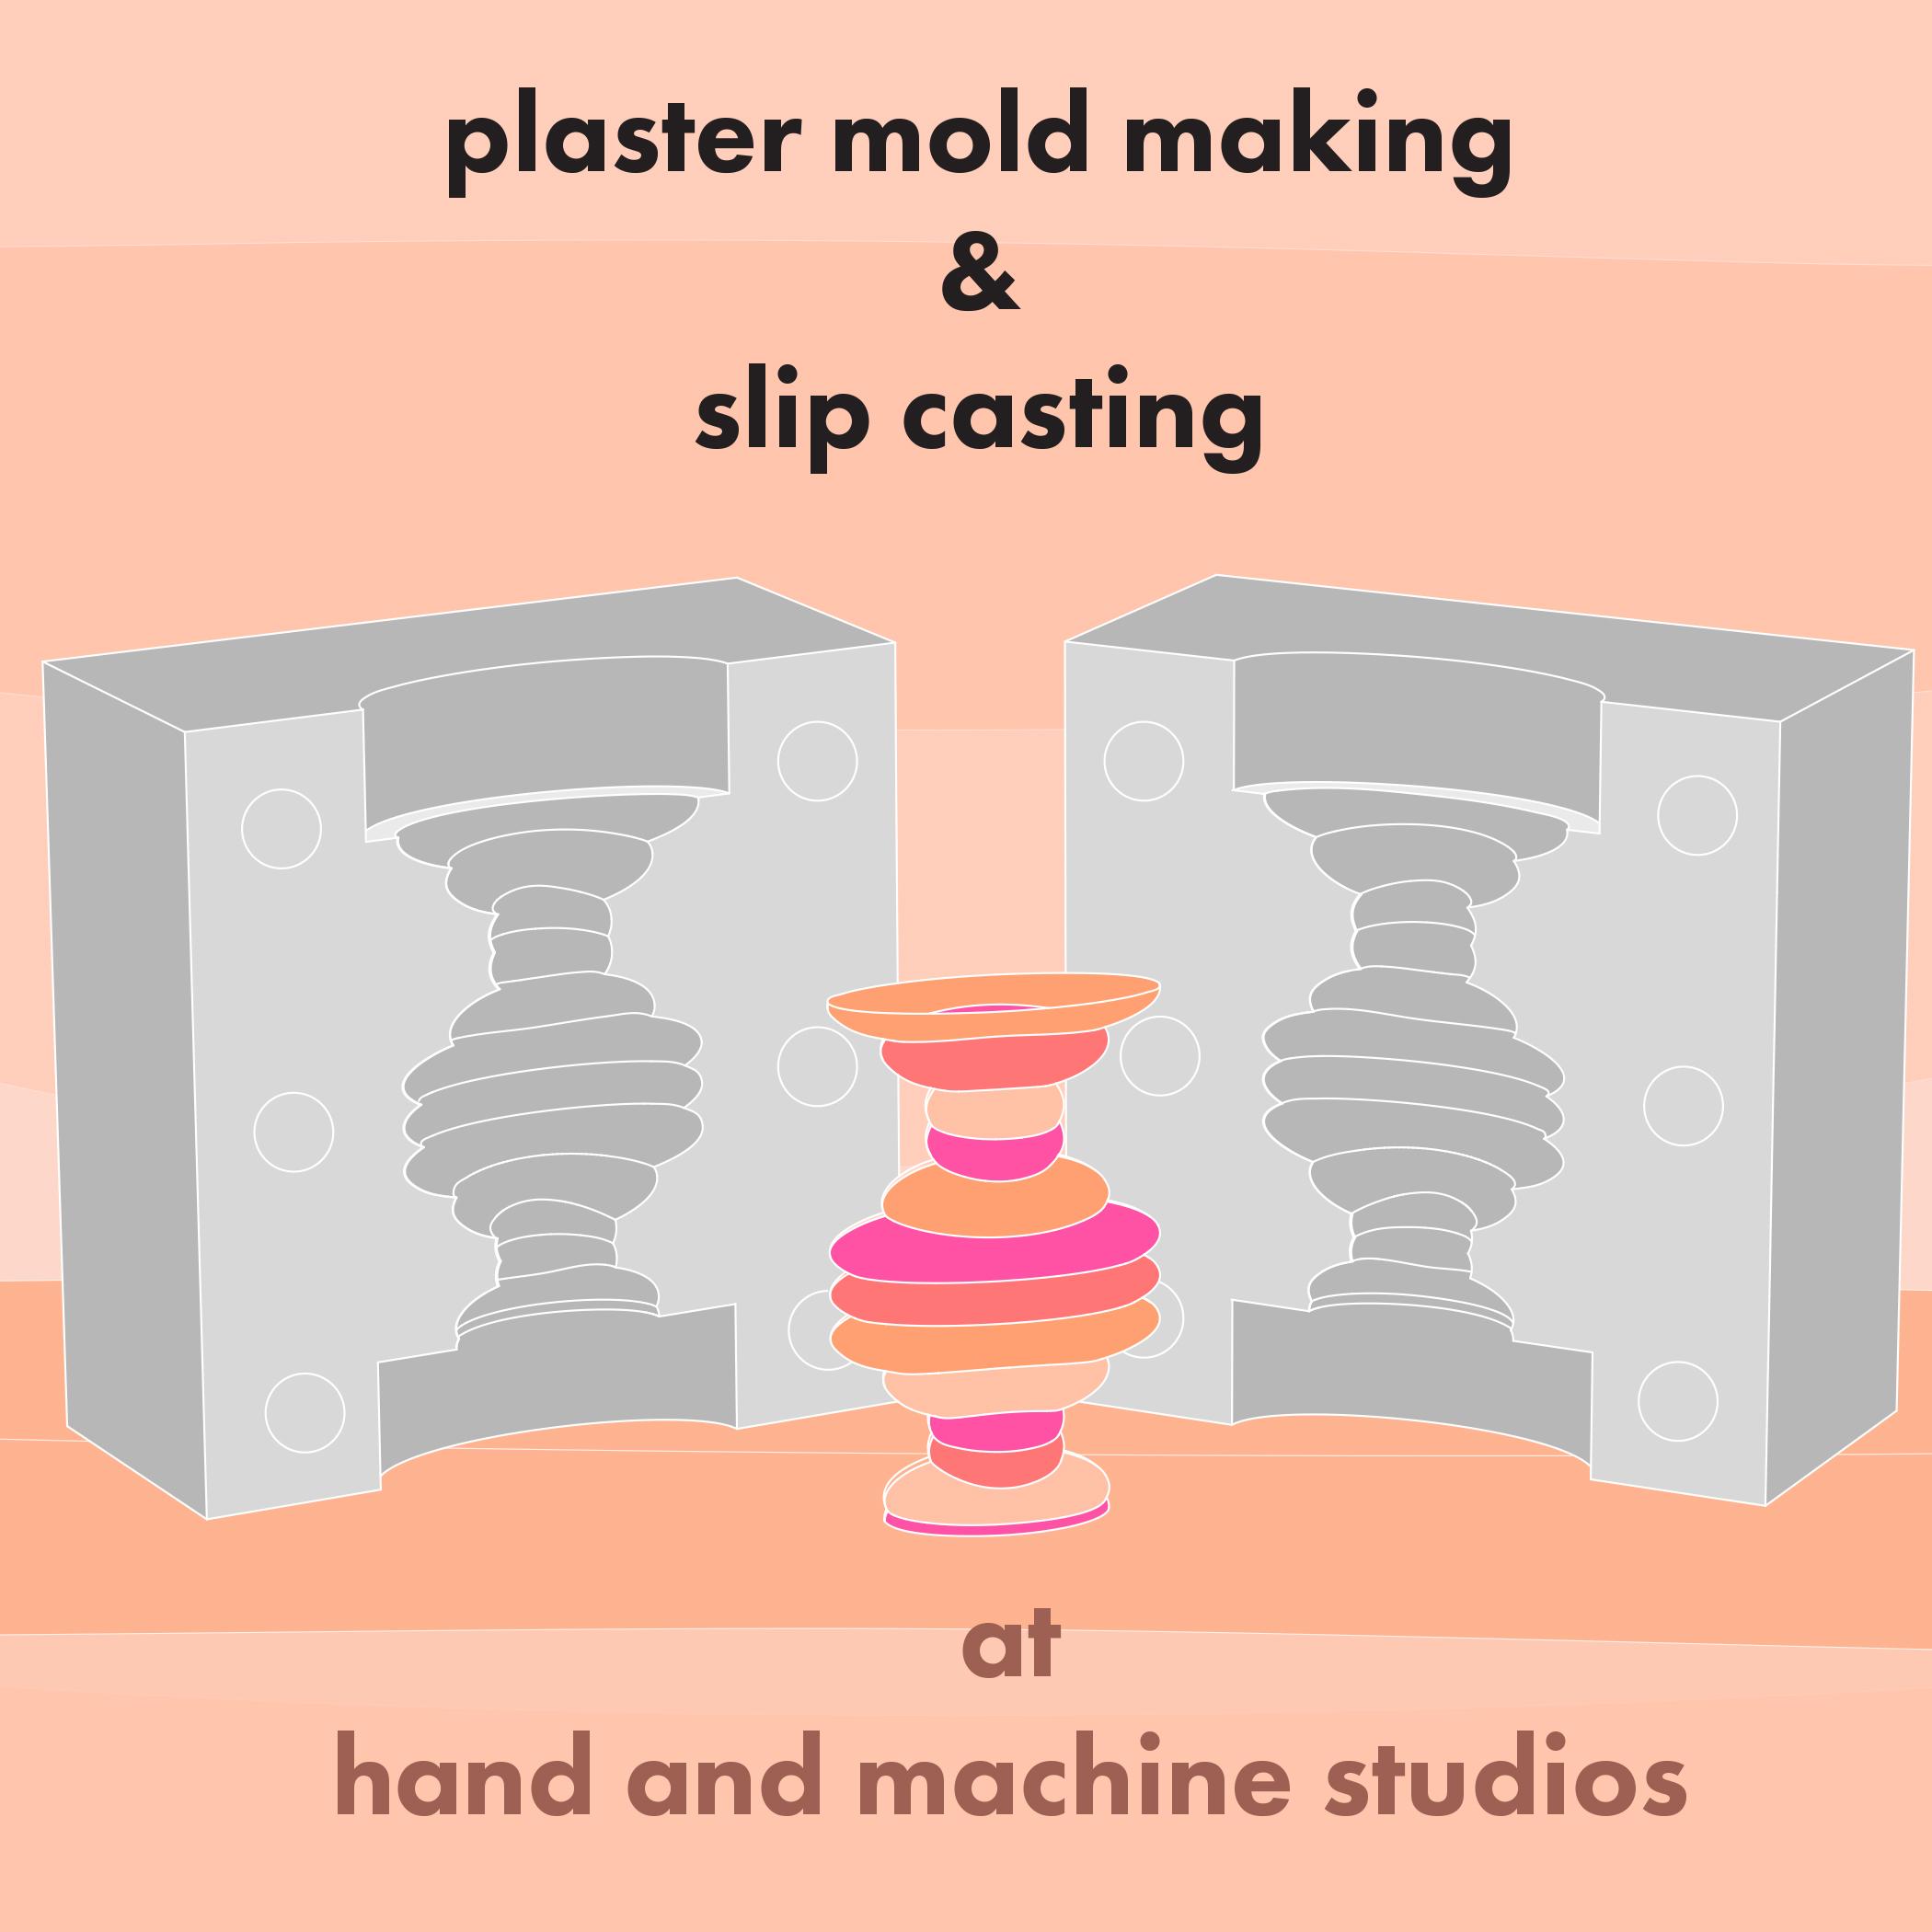 Plaster Mold Making & Slip Casting : Starts March 5th Sunday morning — Hand  & Machine Ceramic Studio: Ceramic Classes, Pottery Classes, & Custom